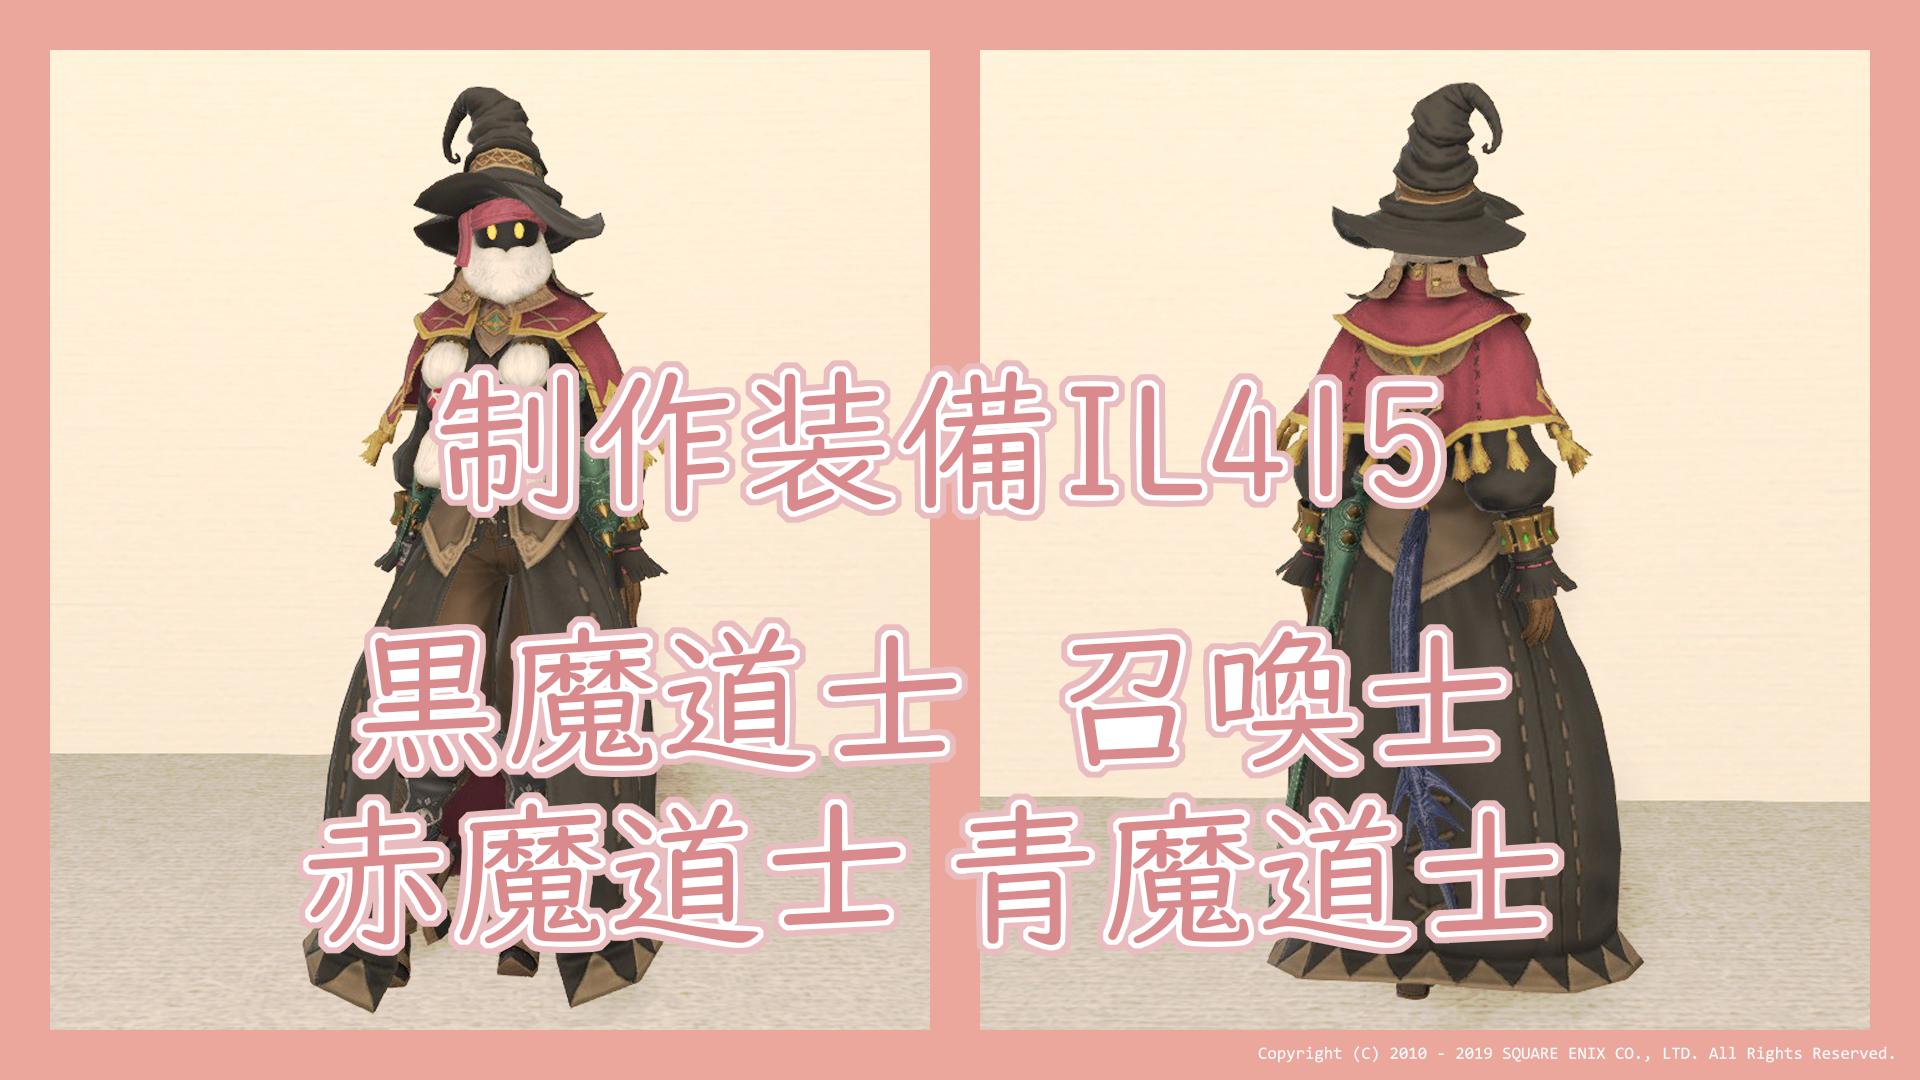 【FF14】制作で入手できるIL415装備【黒召赤青】